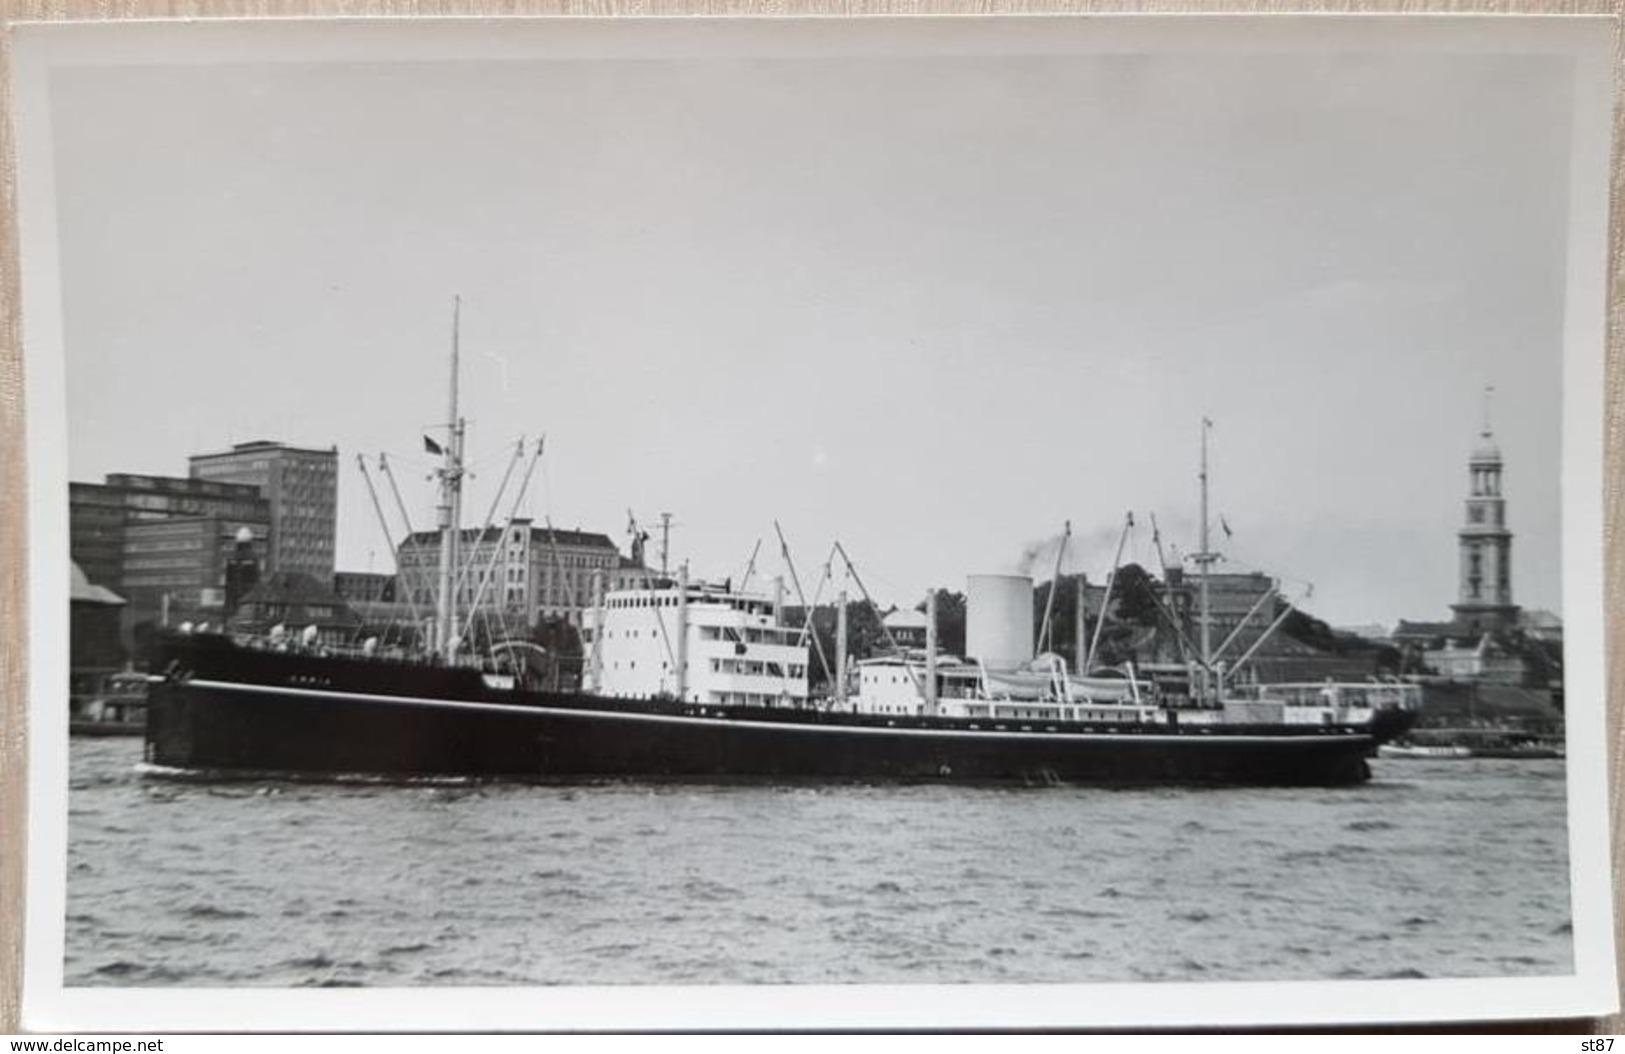 The Ship Erria 1932 - Ships